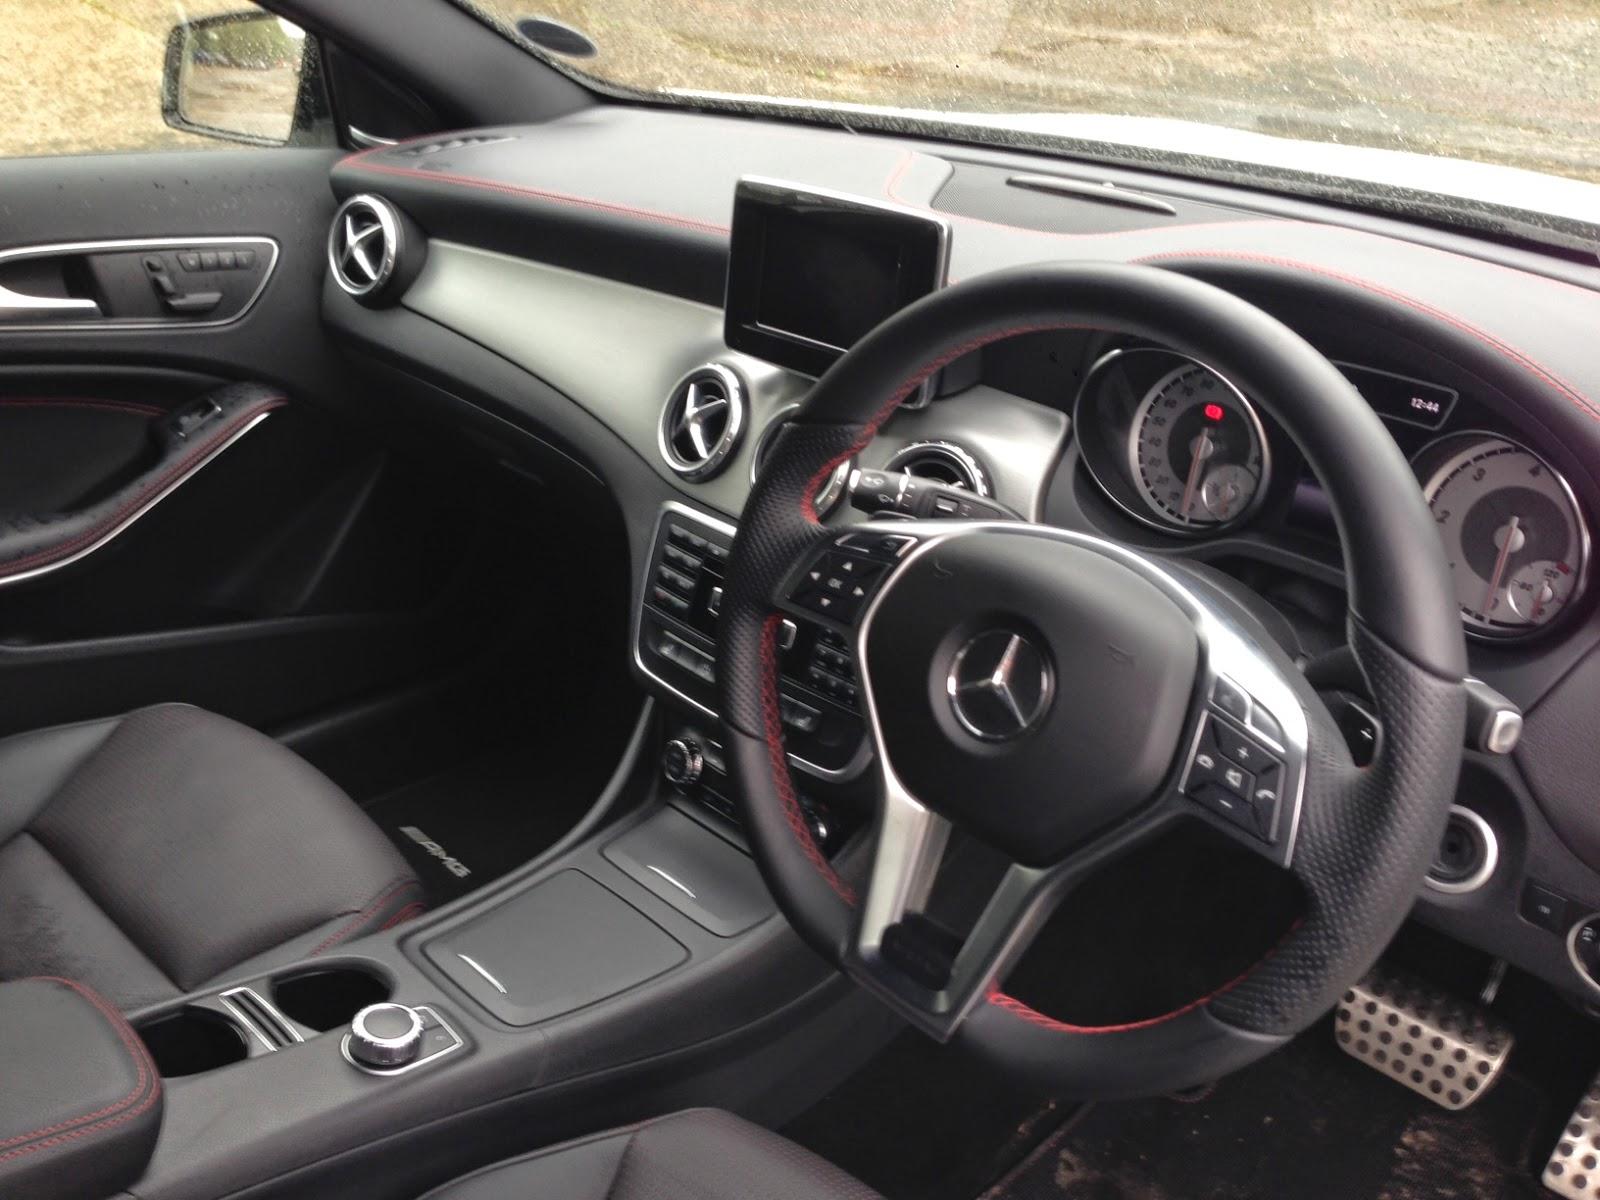 Mercedes Benz GLA 200 CDI AMG Line